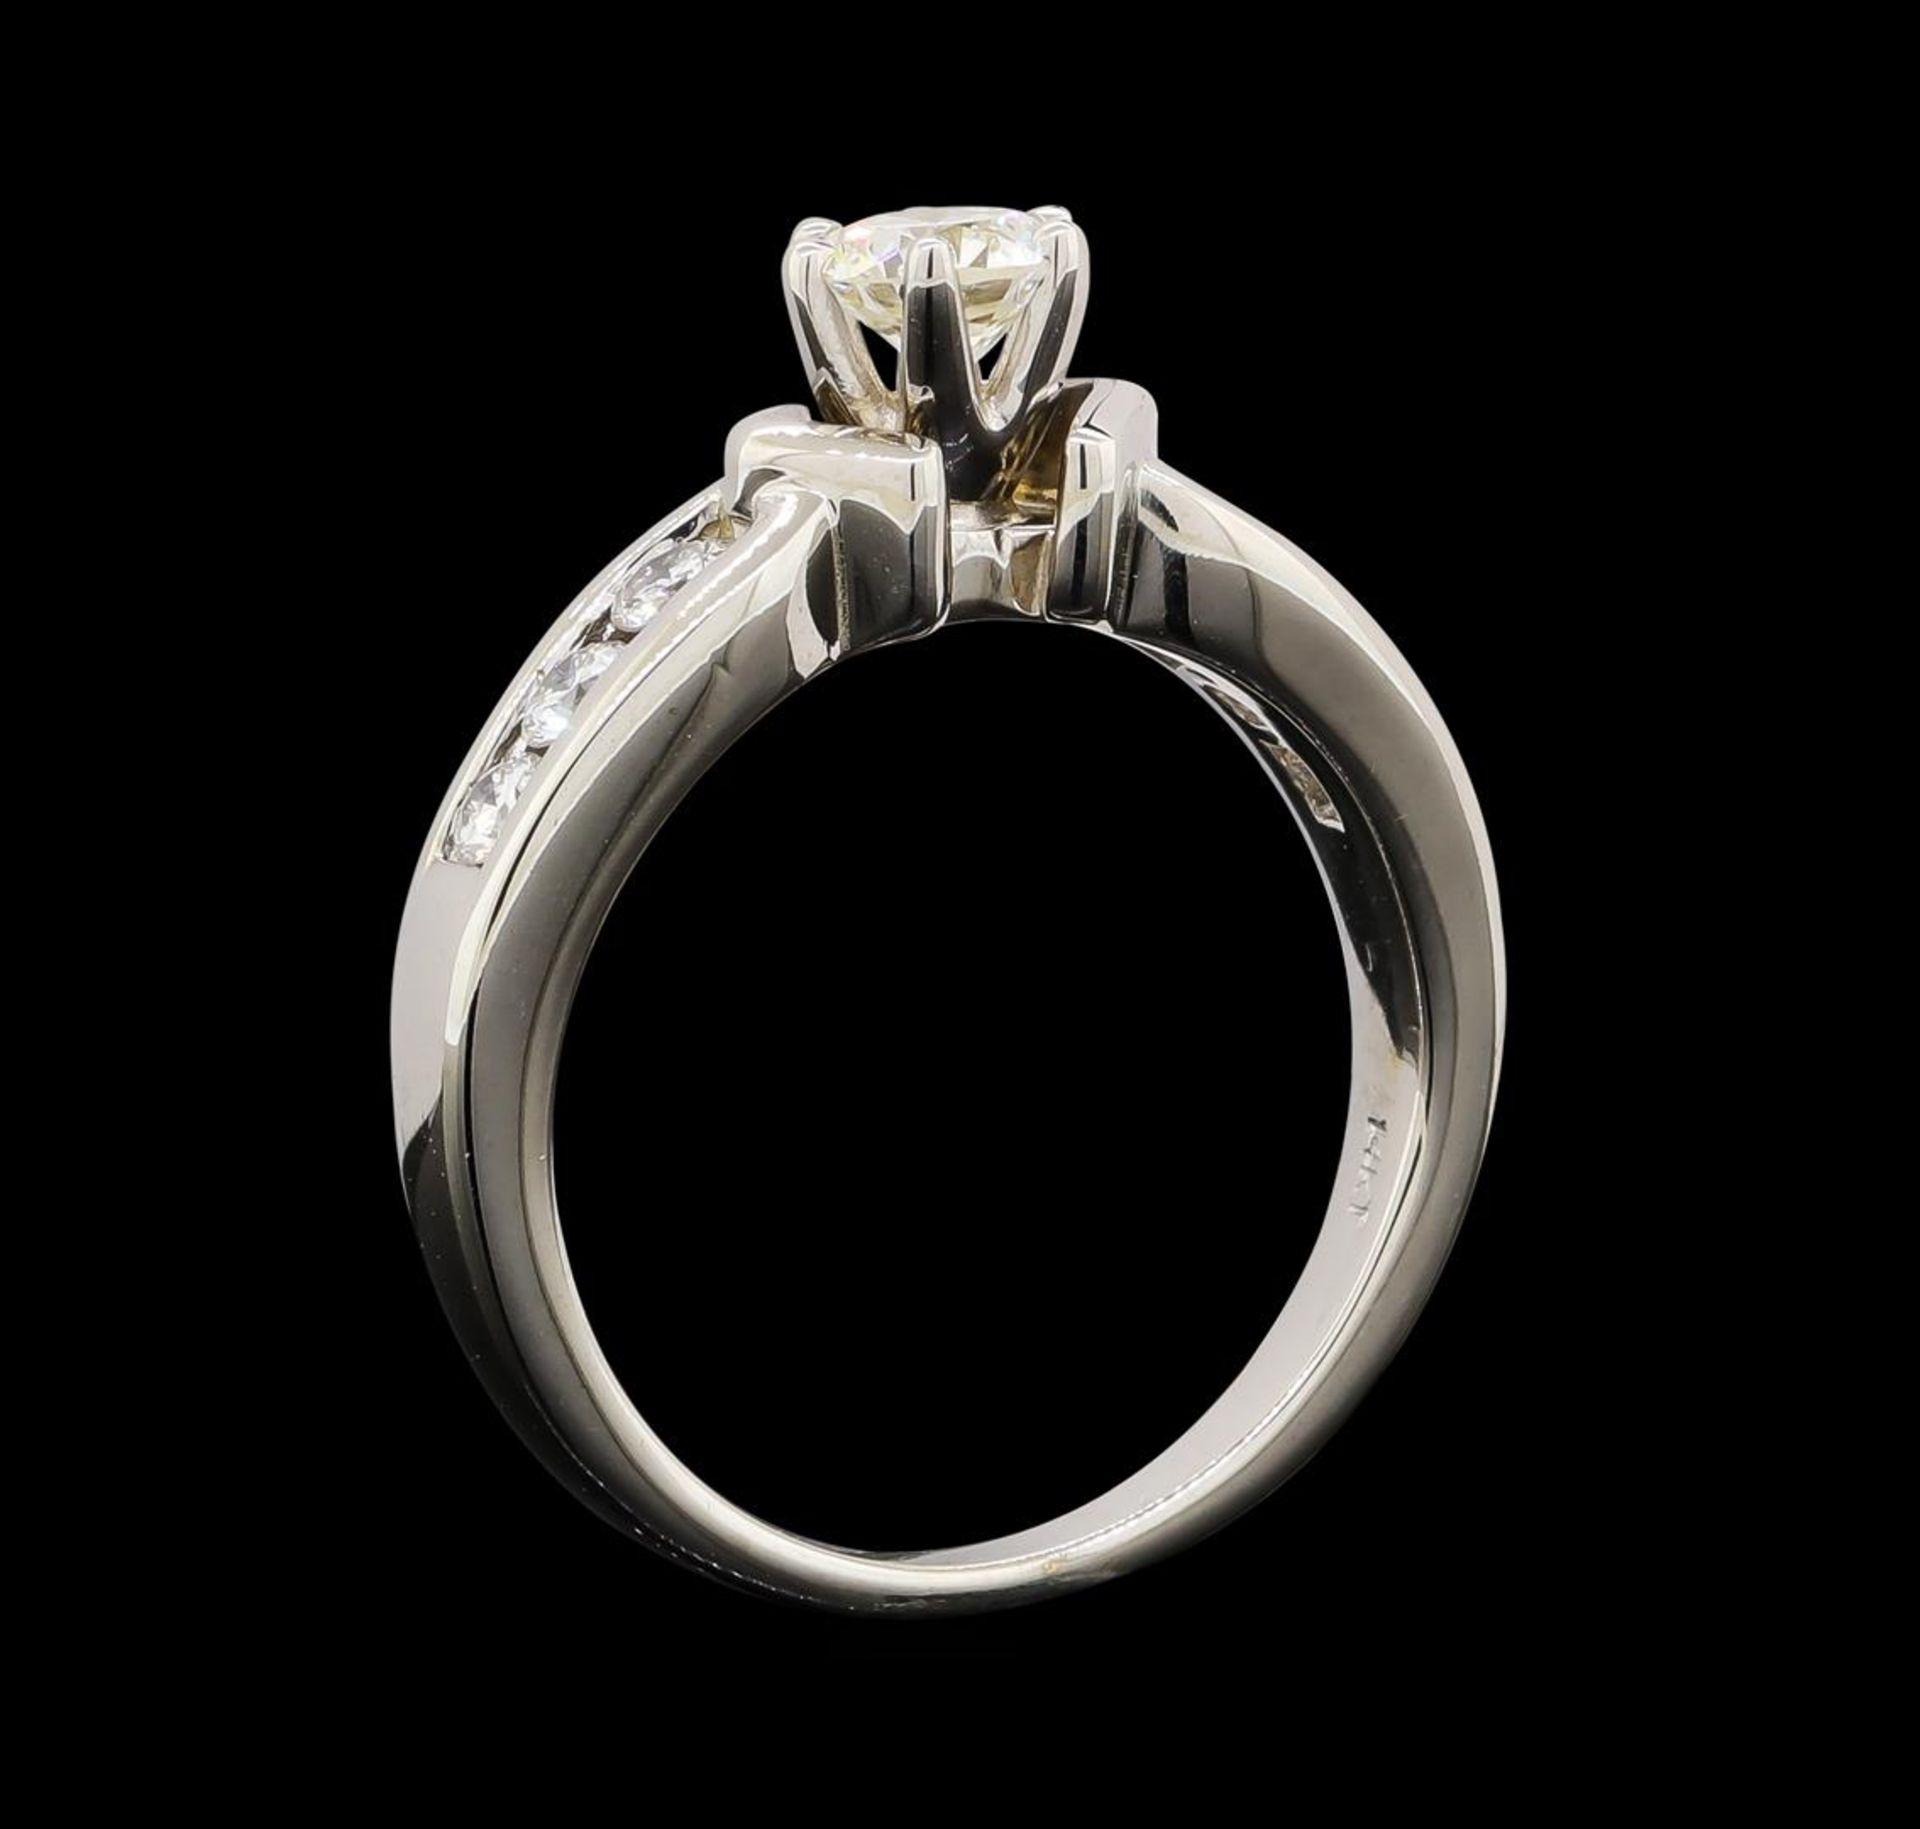 0.80 ctw Diamond Ring - 14KT White Gold - Image 4 of 4